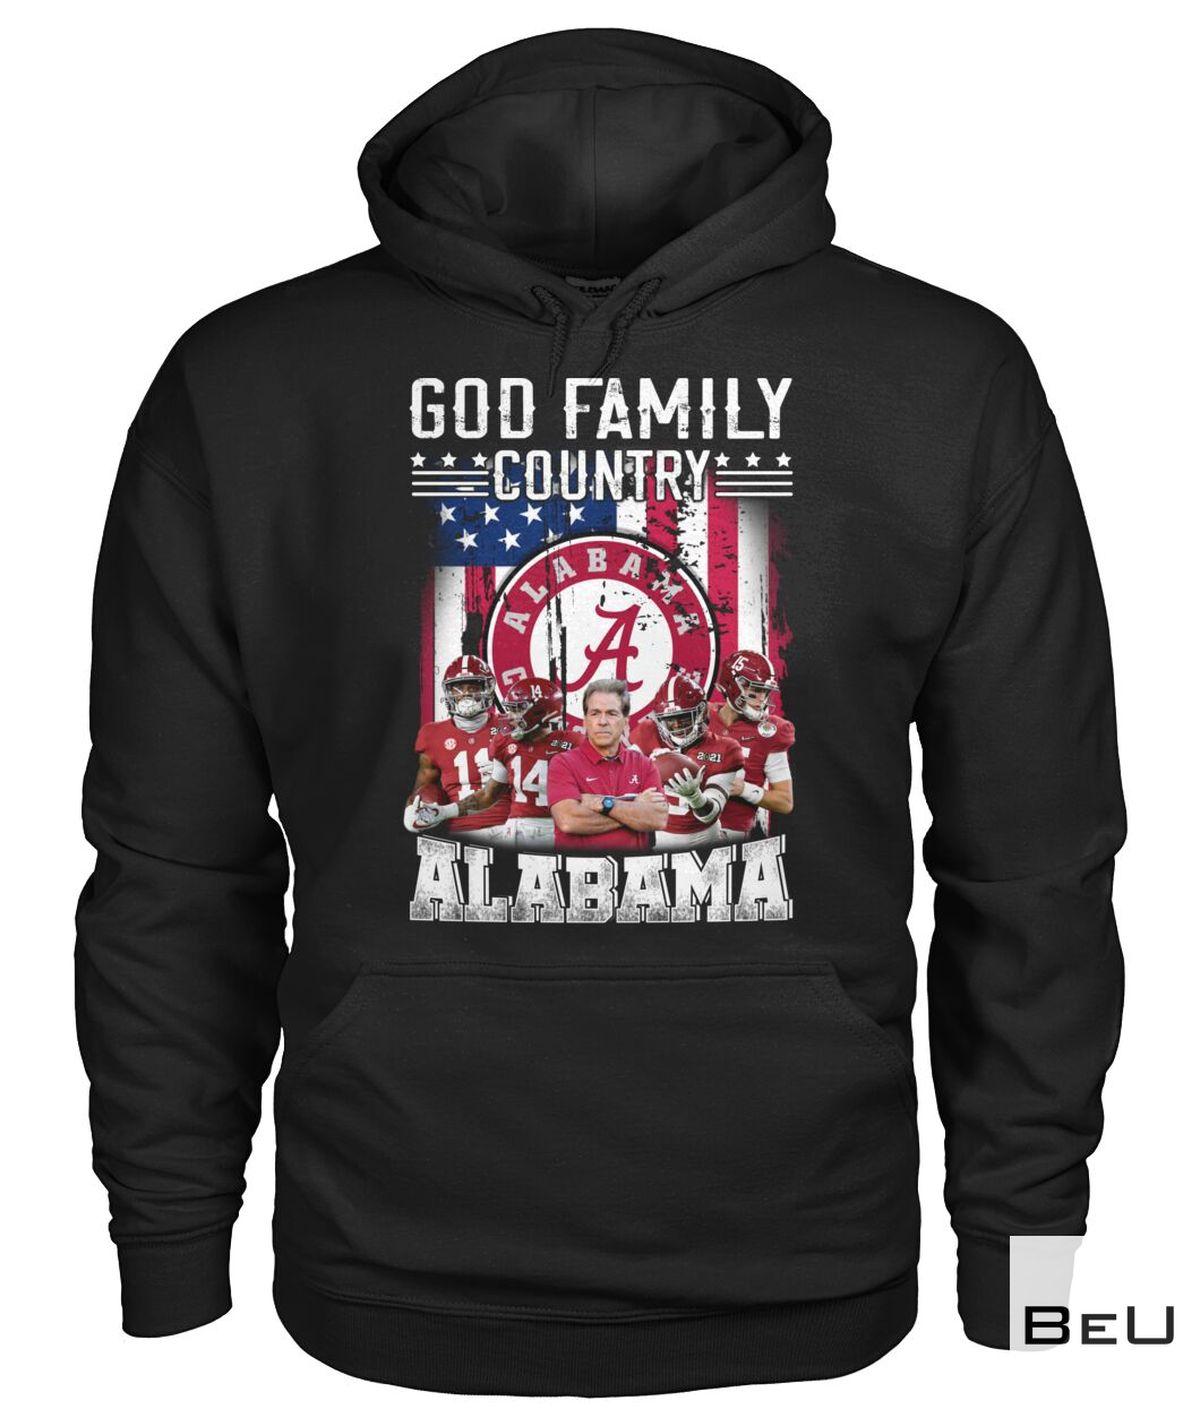 Amazing God Family Country Alabama Shirt, hoodie, tank top